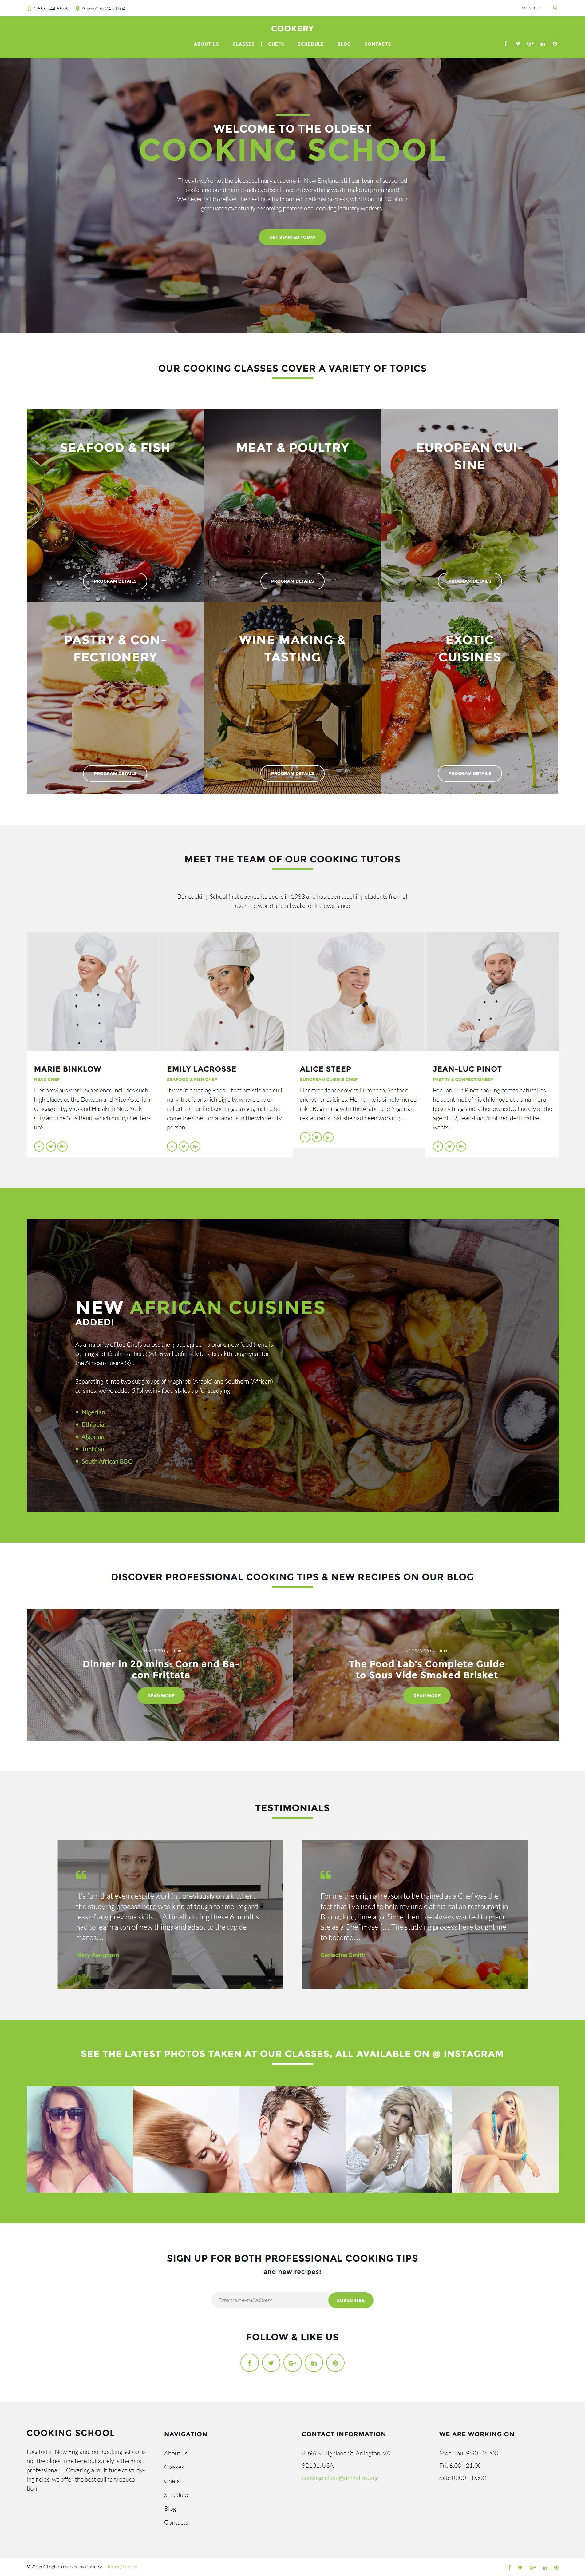 Cooking - Culinary School Responsive №60130 - скриншот